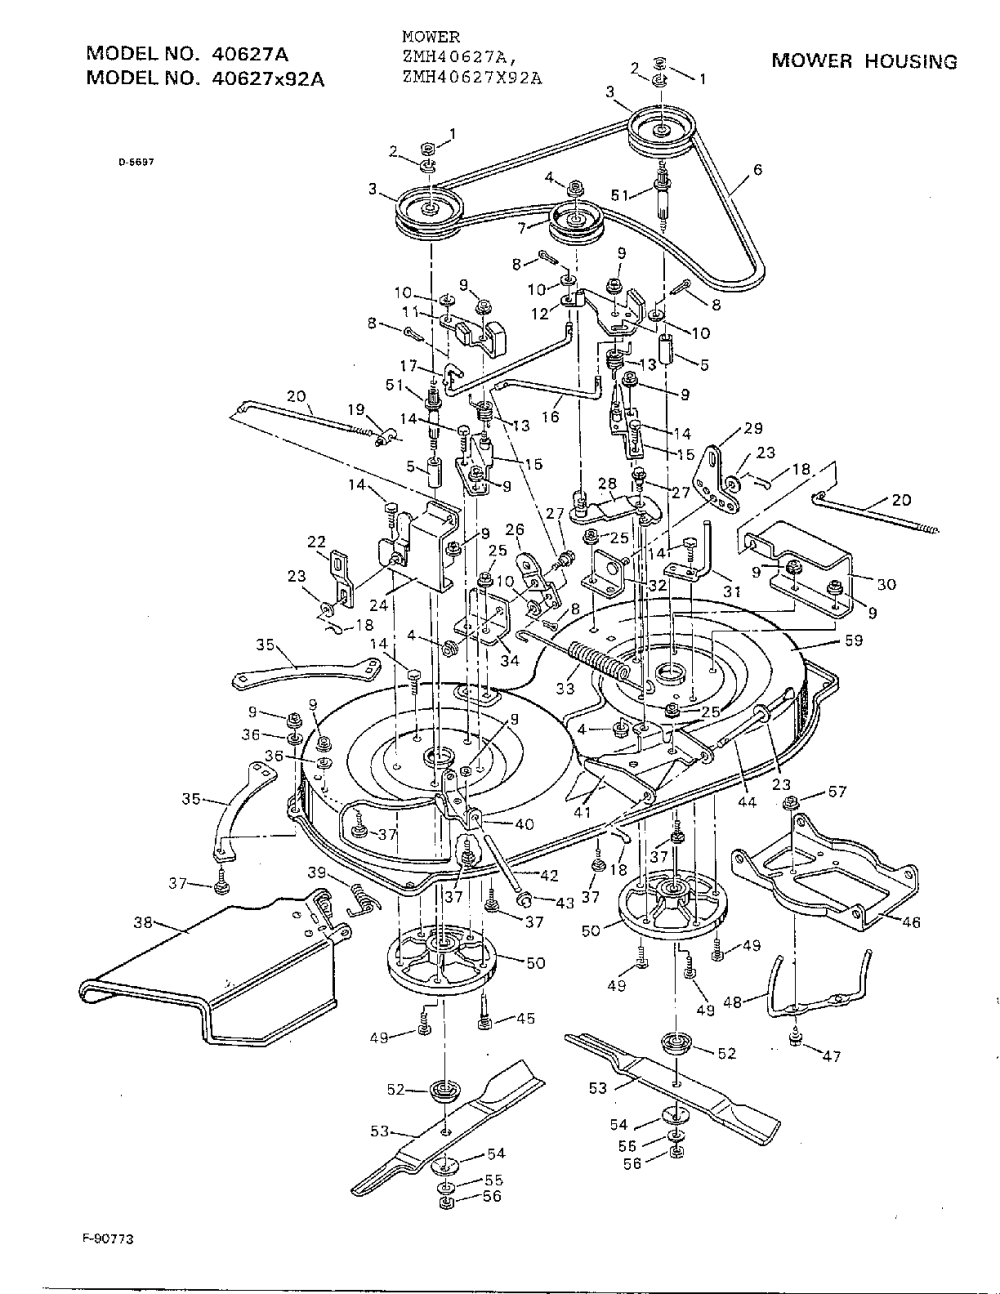 medium resolution of murray 40627x92a mower housing diagram